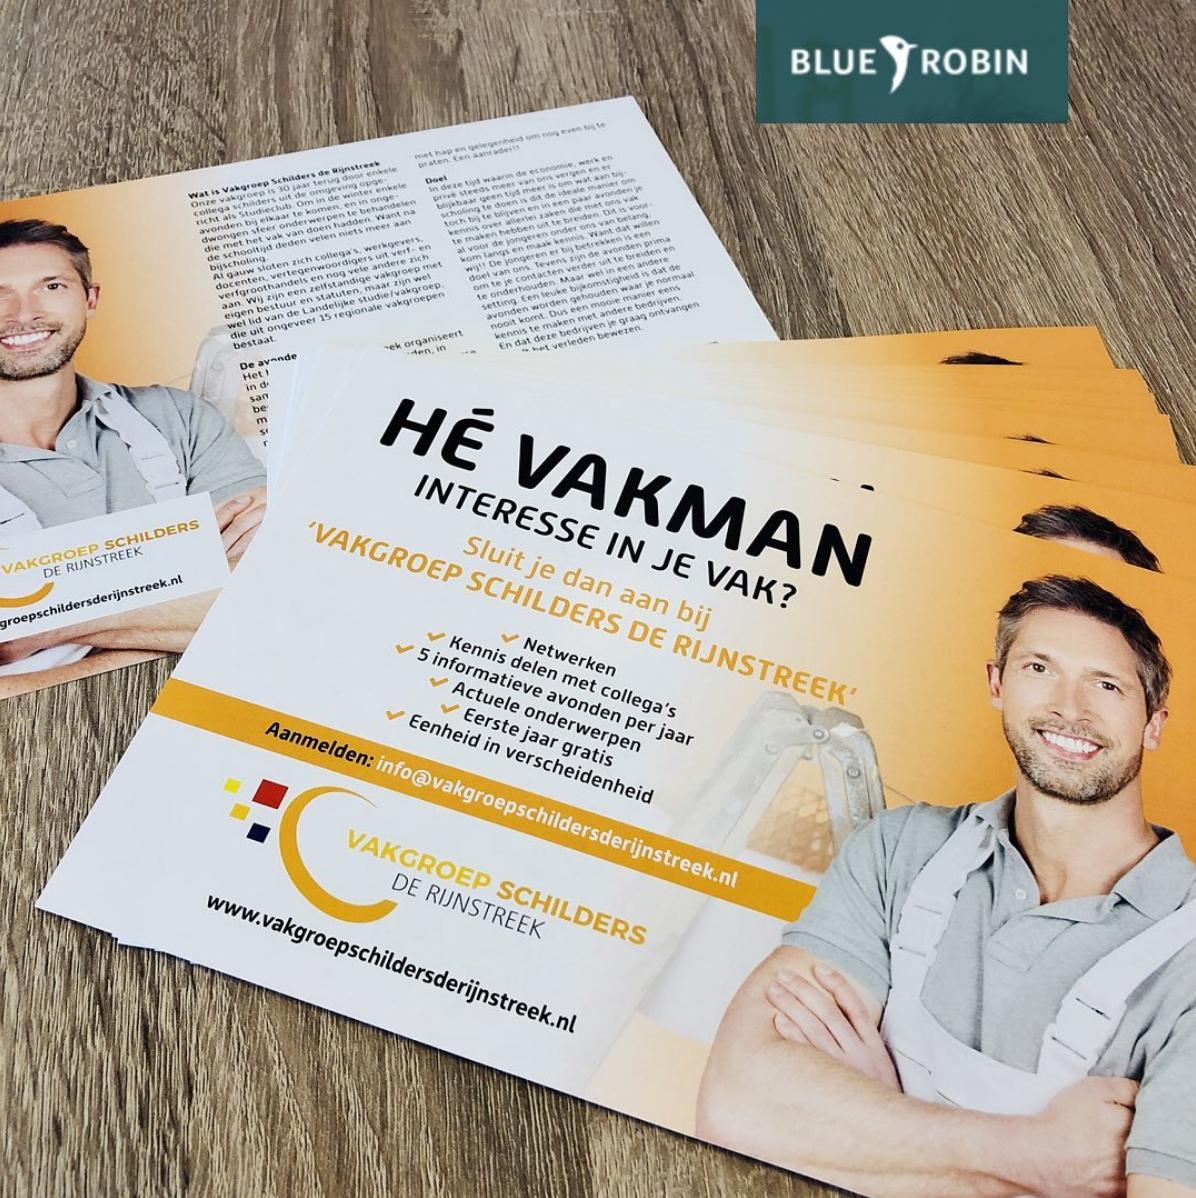 flyers-he vakman